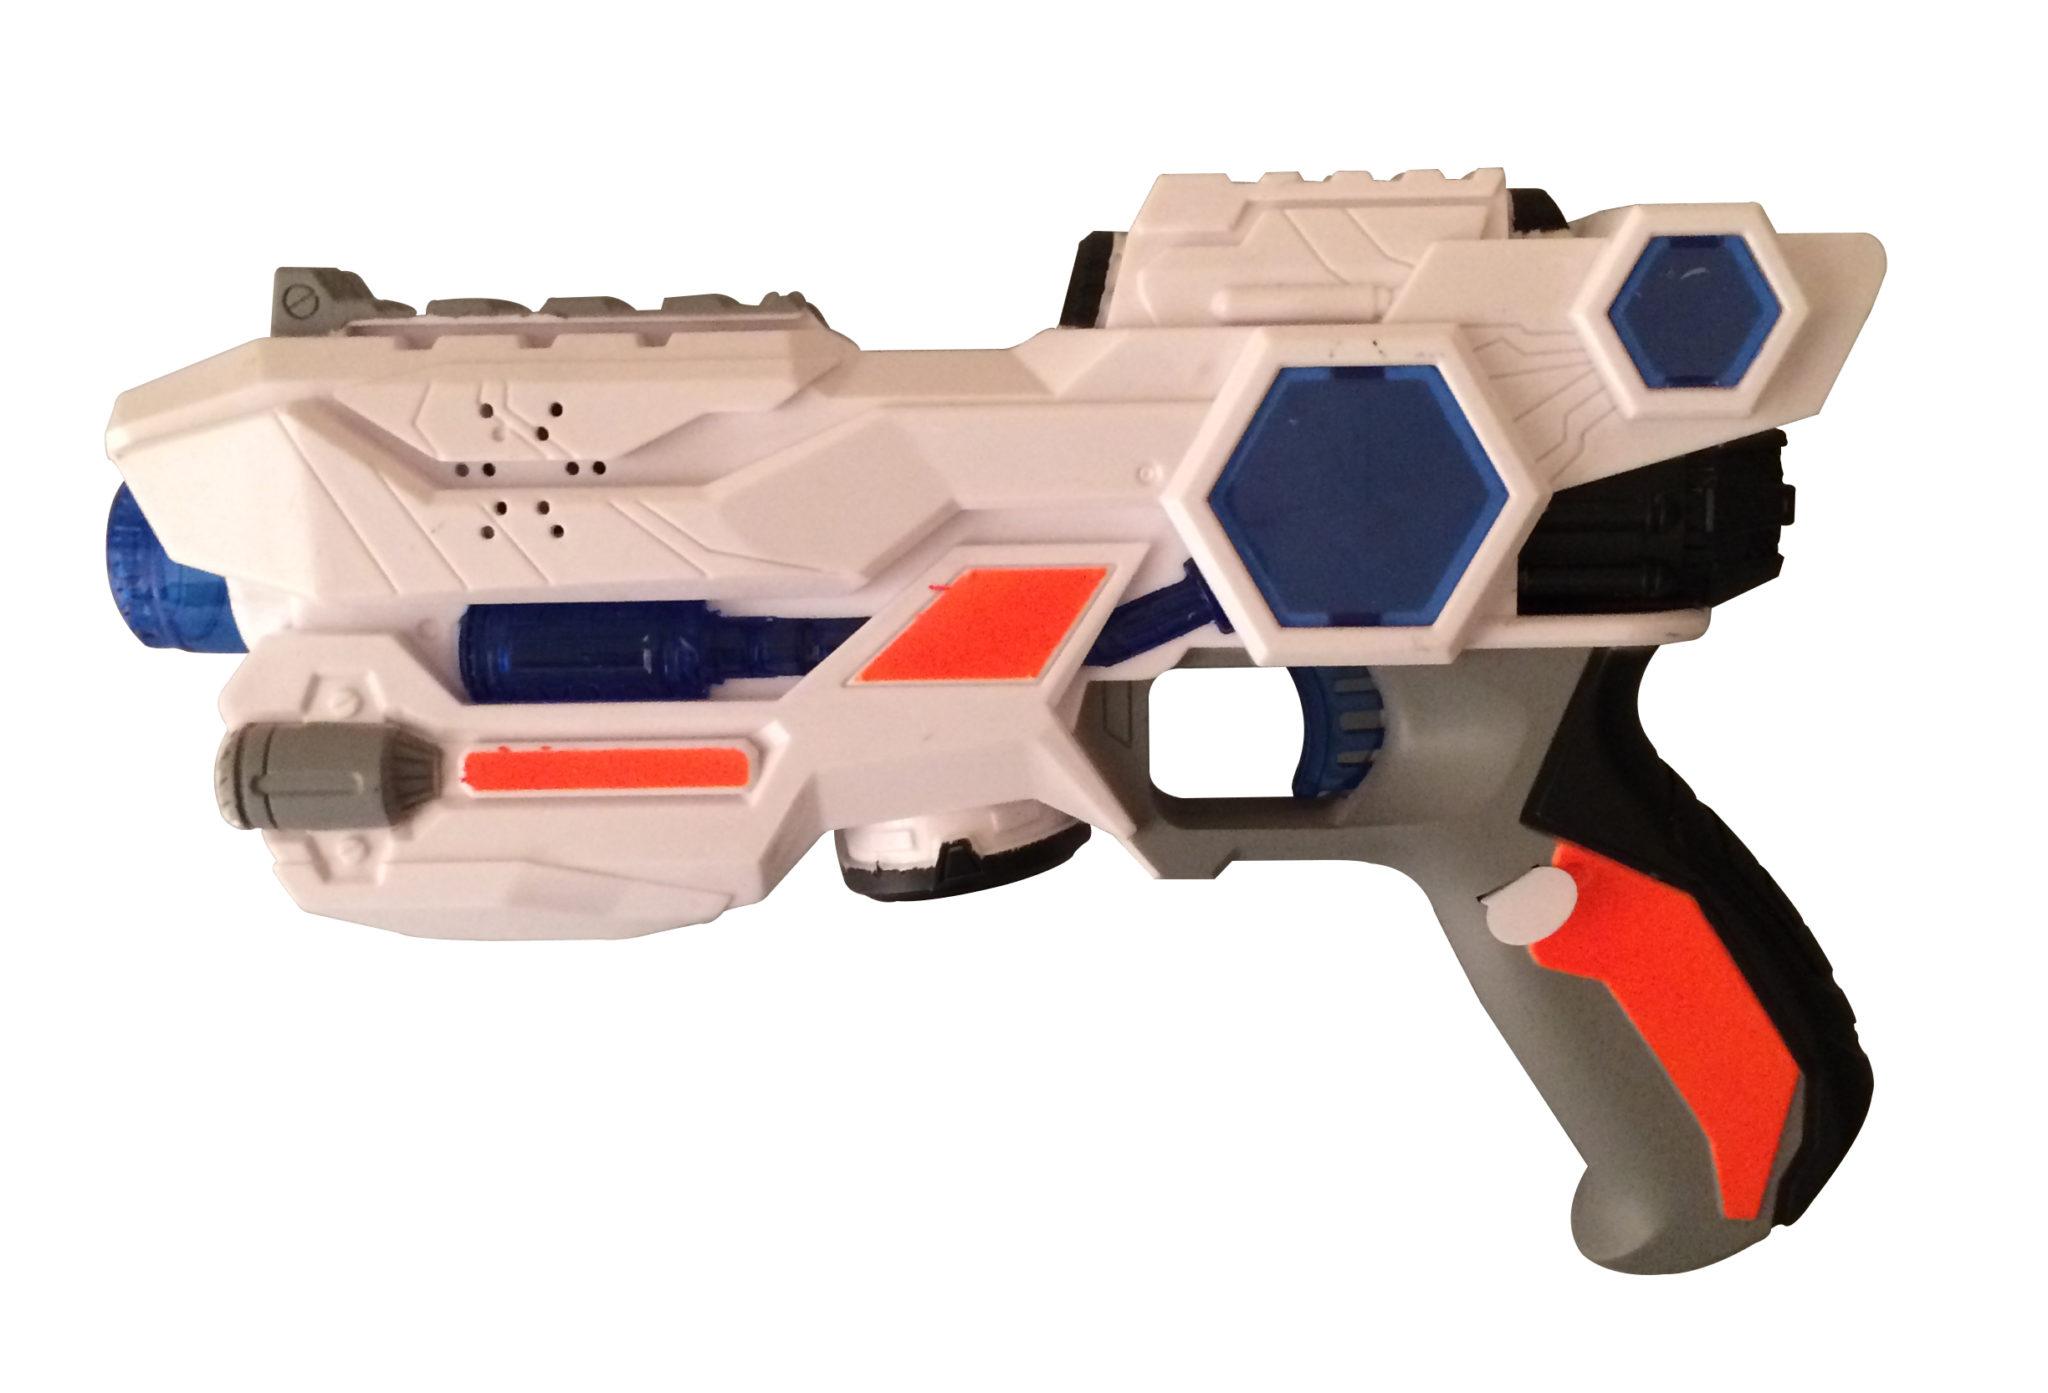 Space Wars Blaster